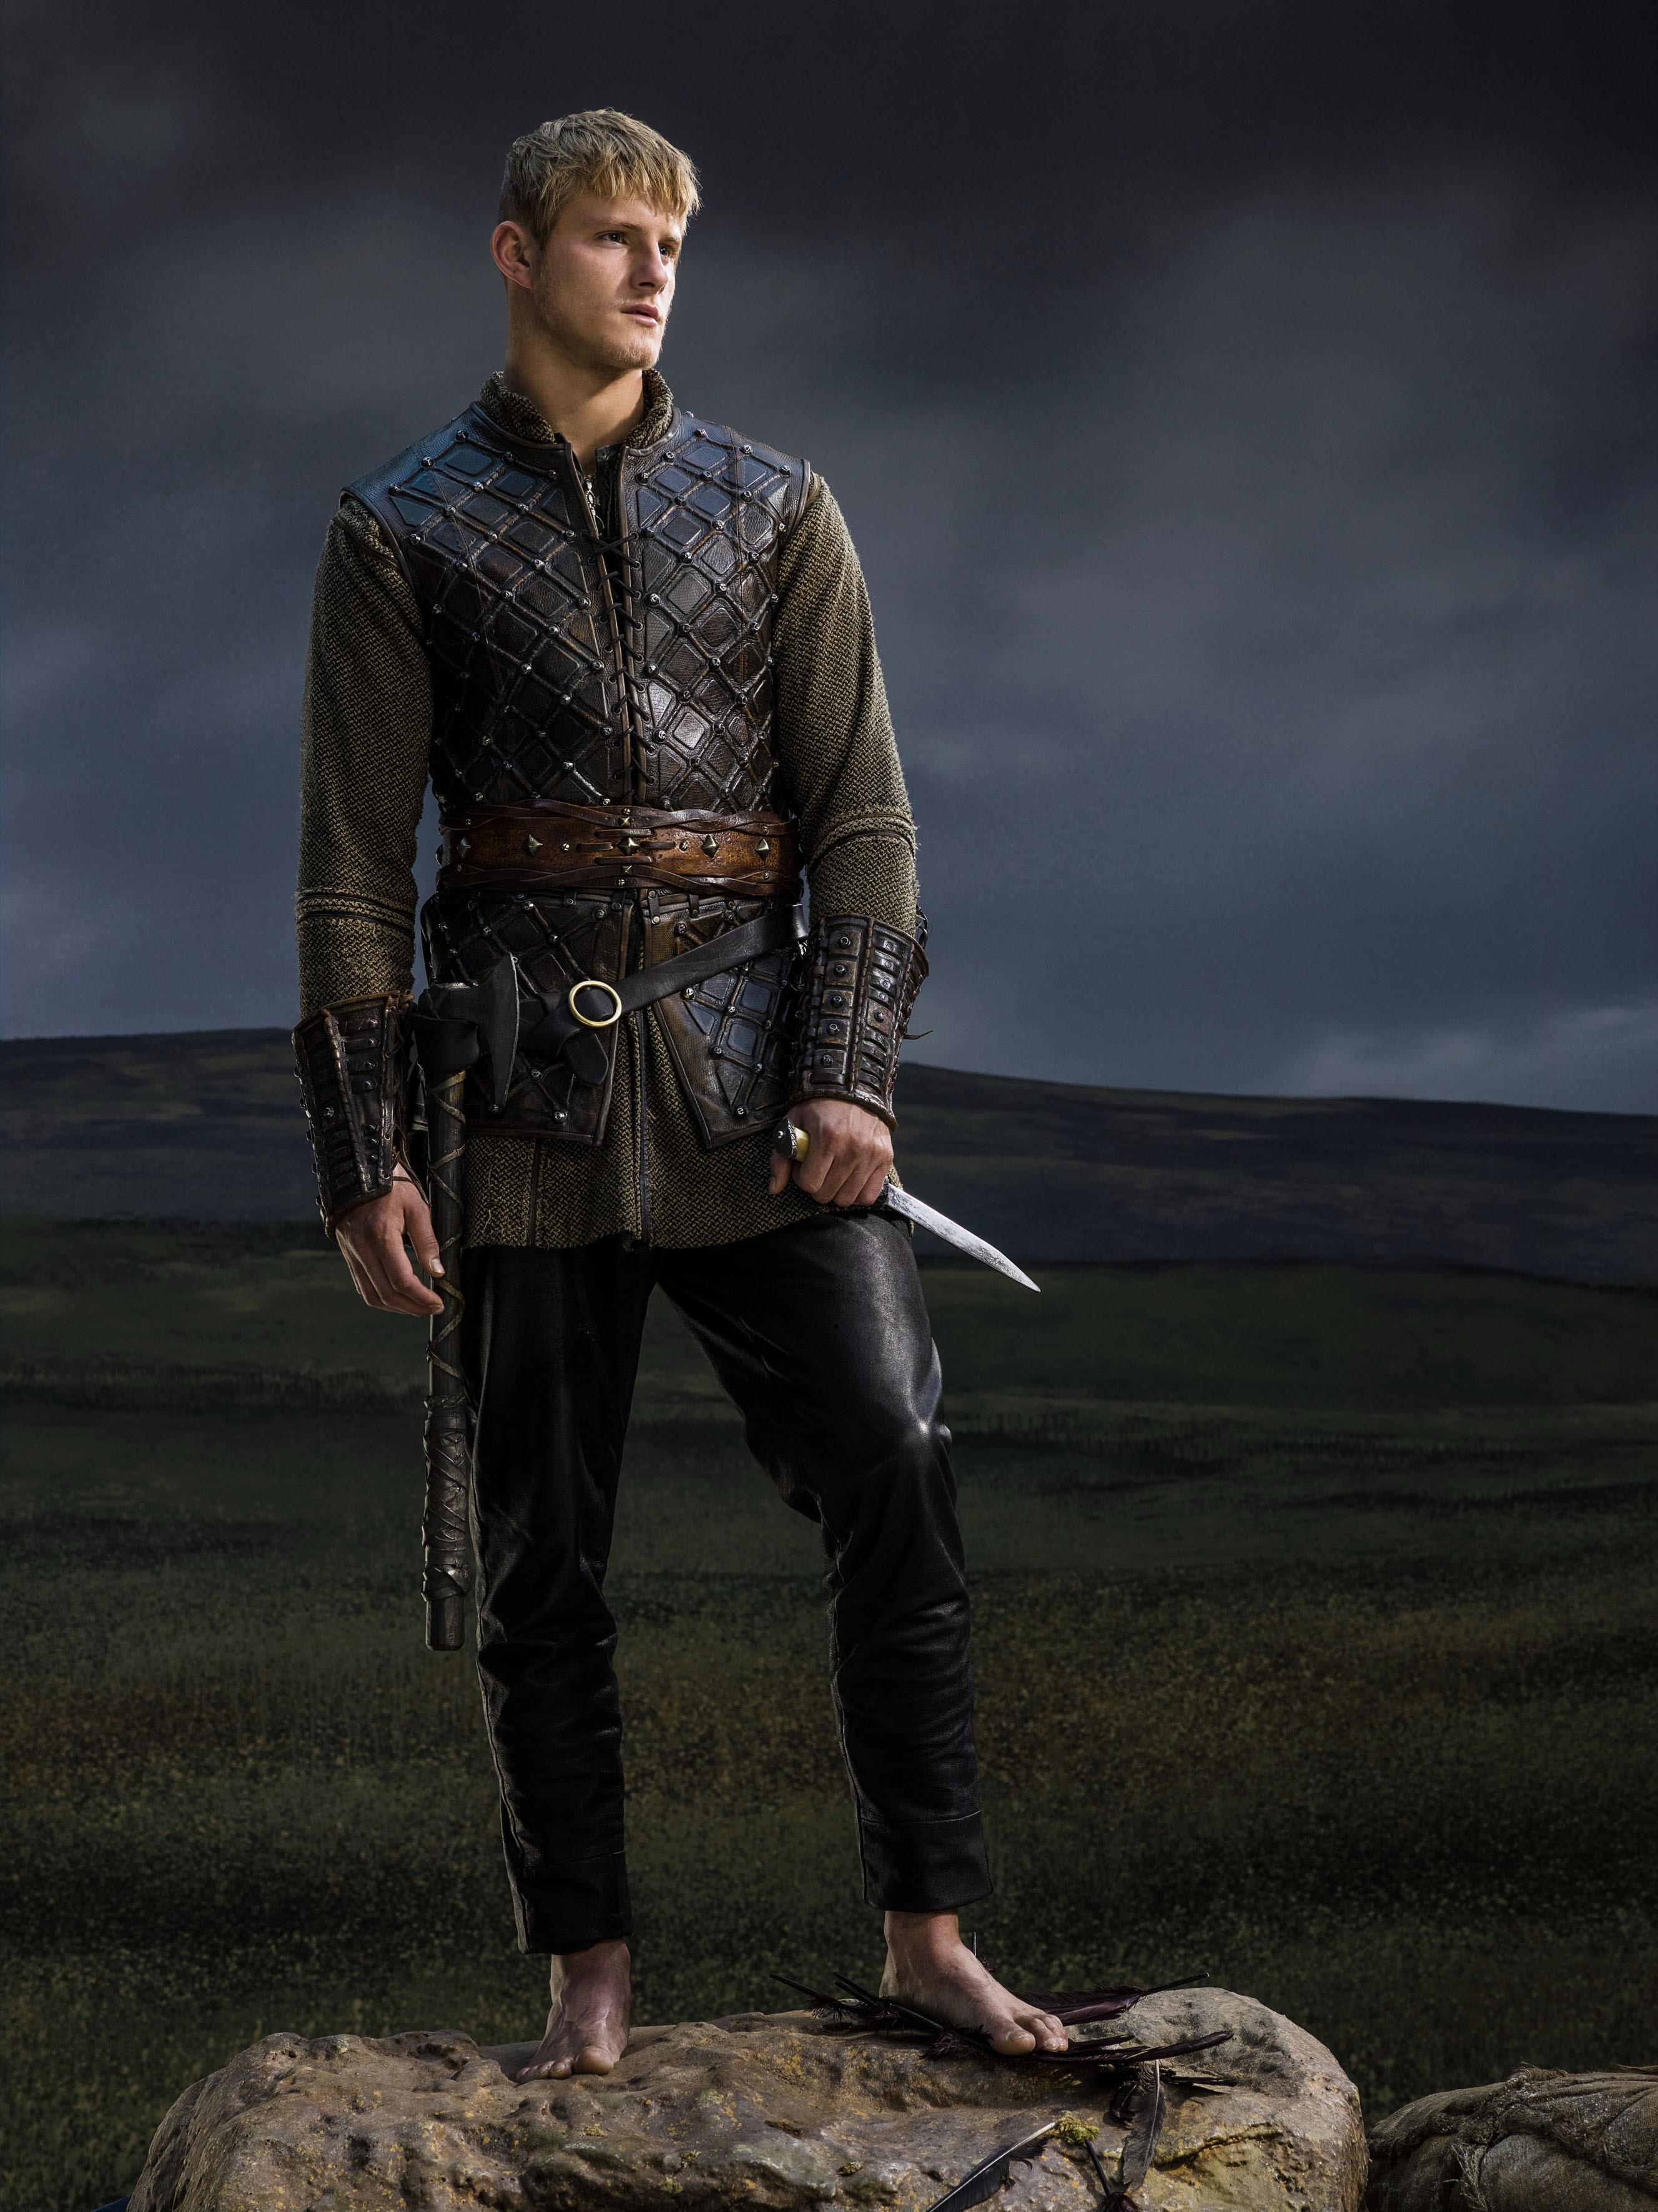 http://images6.fanpop.com/image/photos/37600000/Vikings-Season-2-Bjorn-Lothbrok-official-picture-vikings-tv-series-37651268-2655-3543.jpg